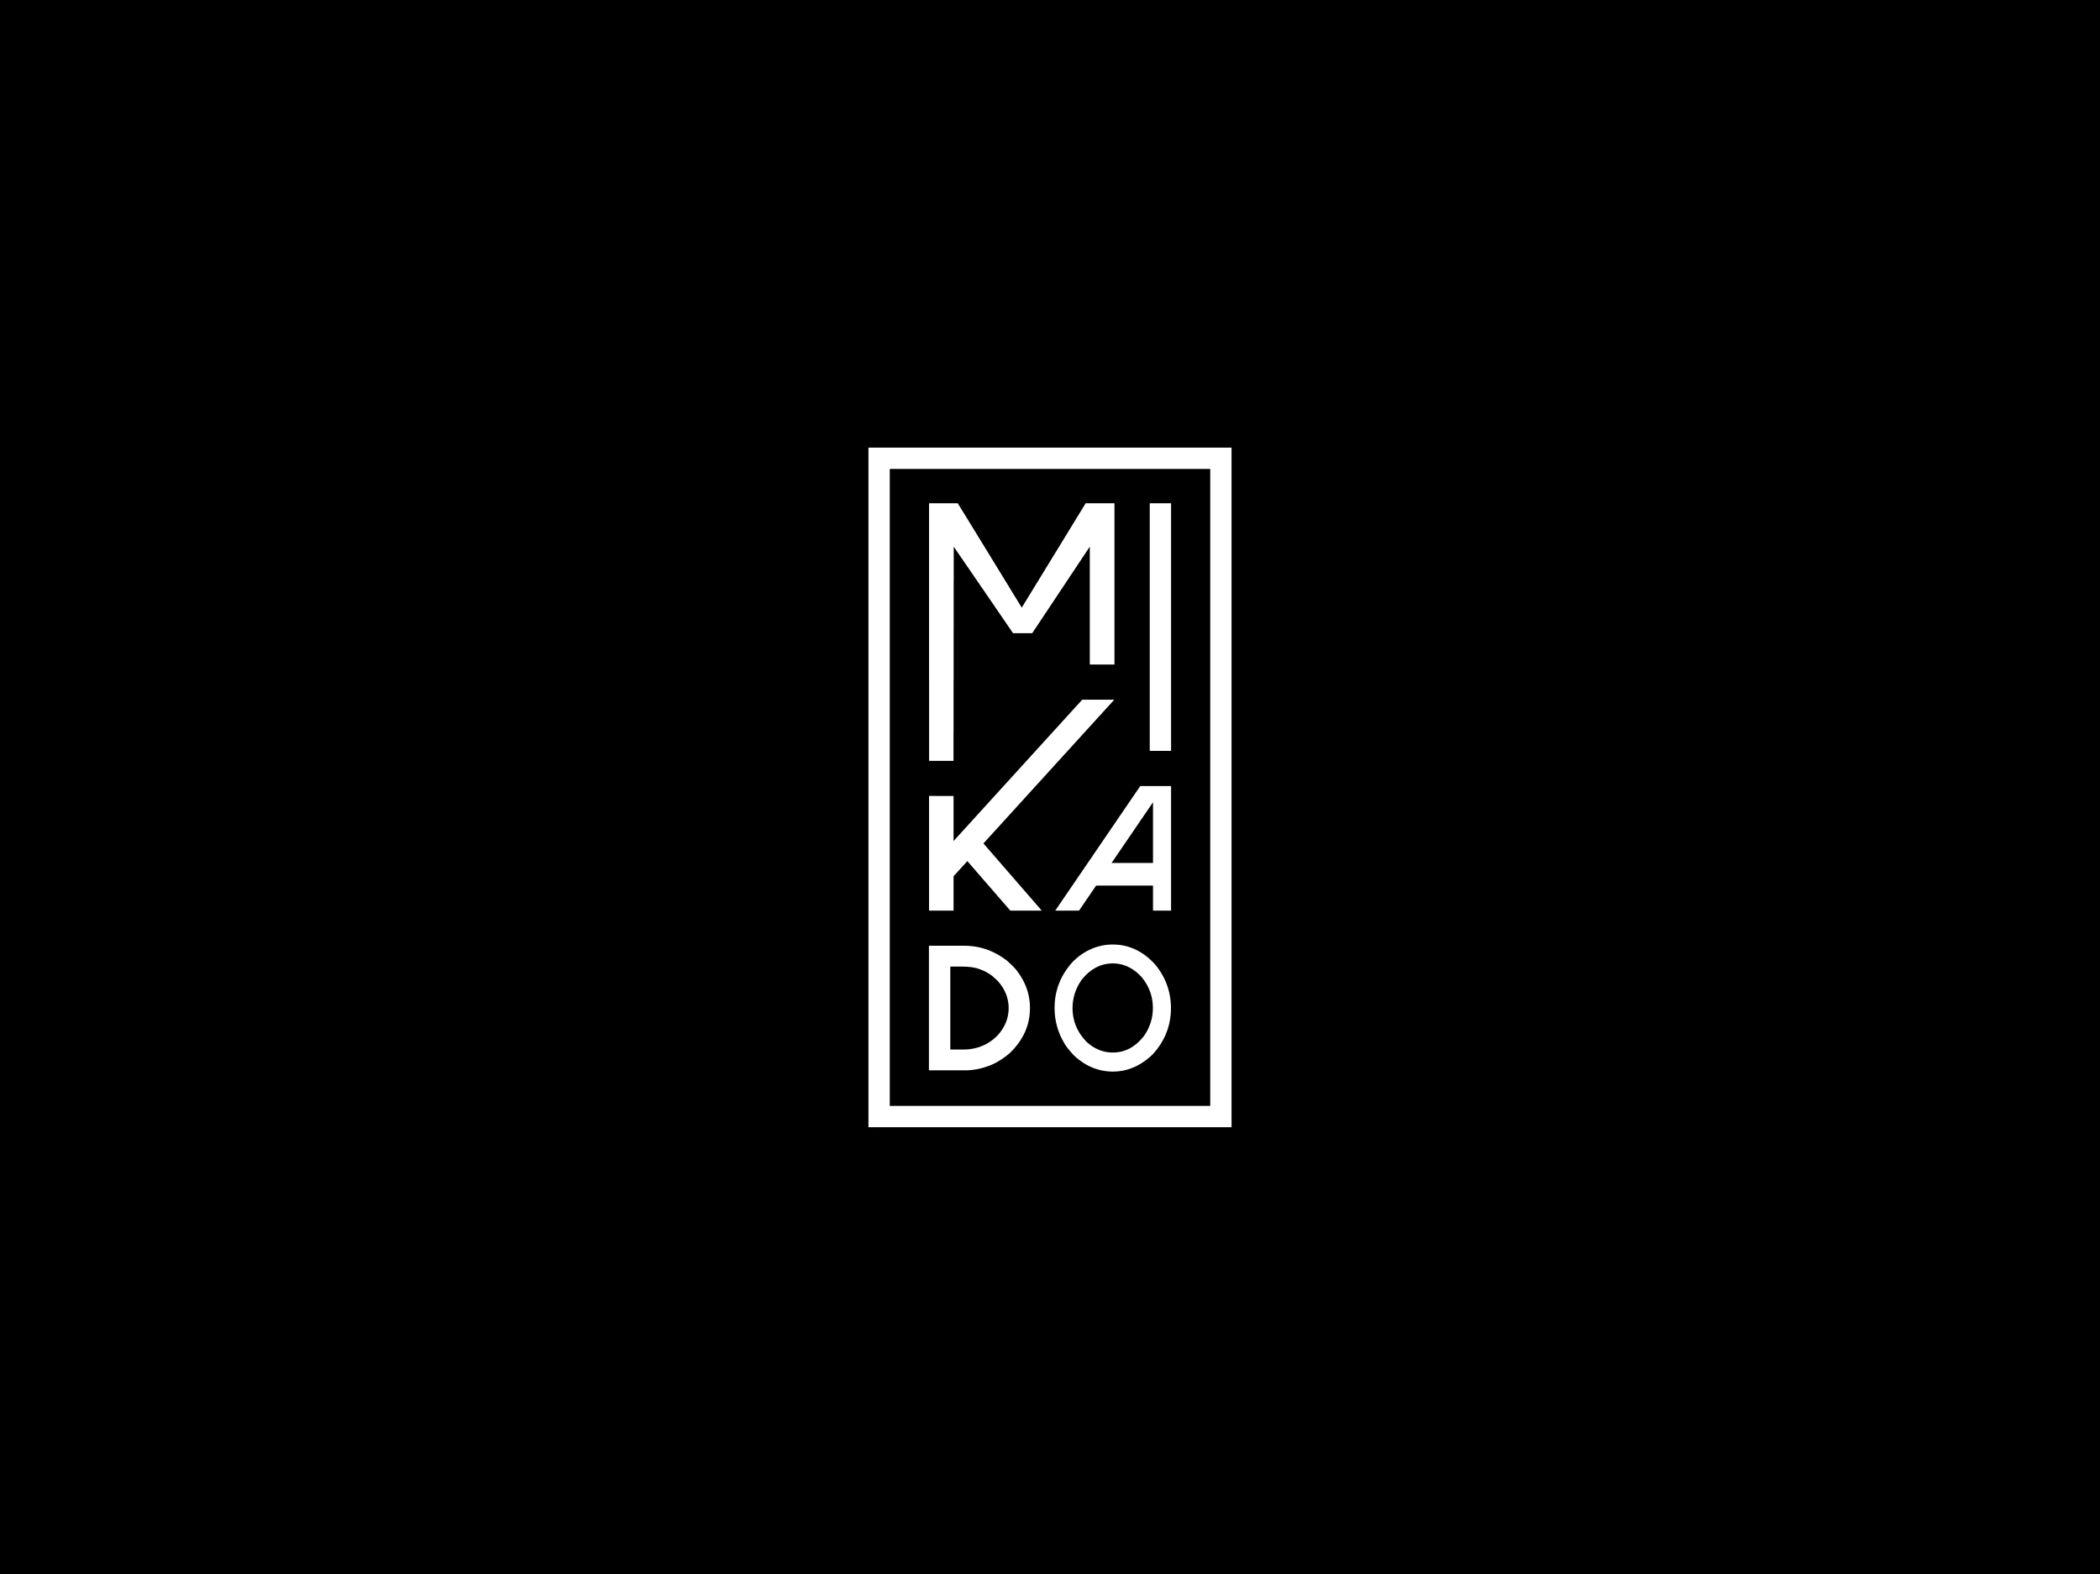 mikado restaurant logo